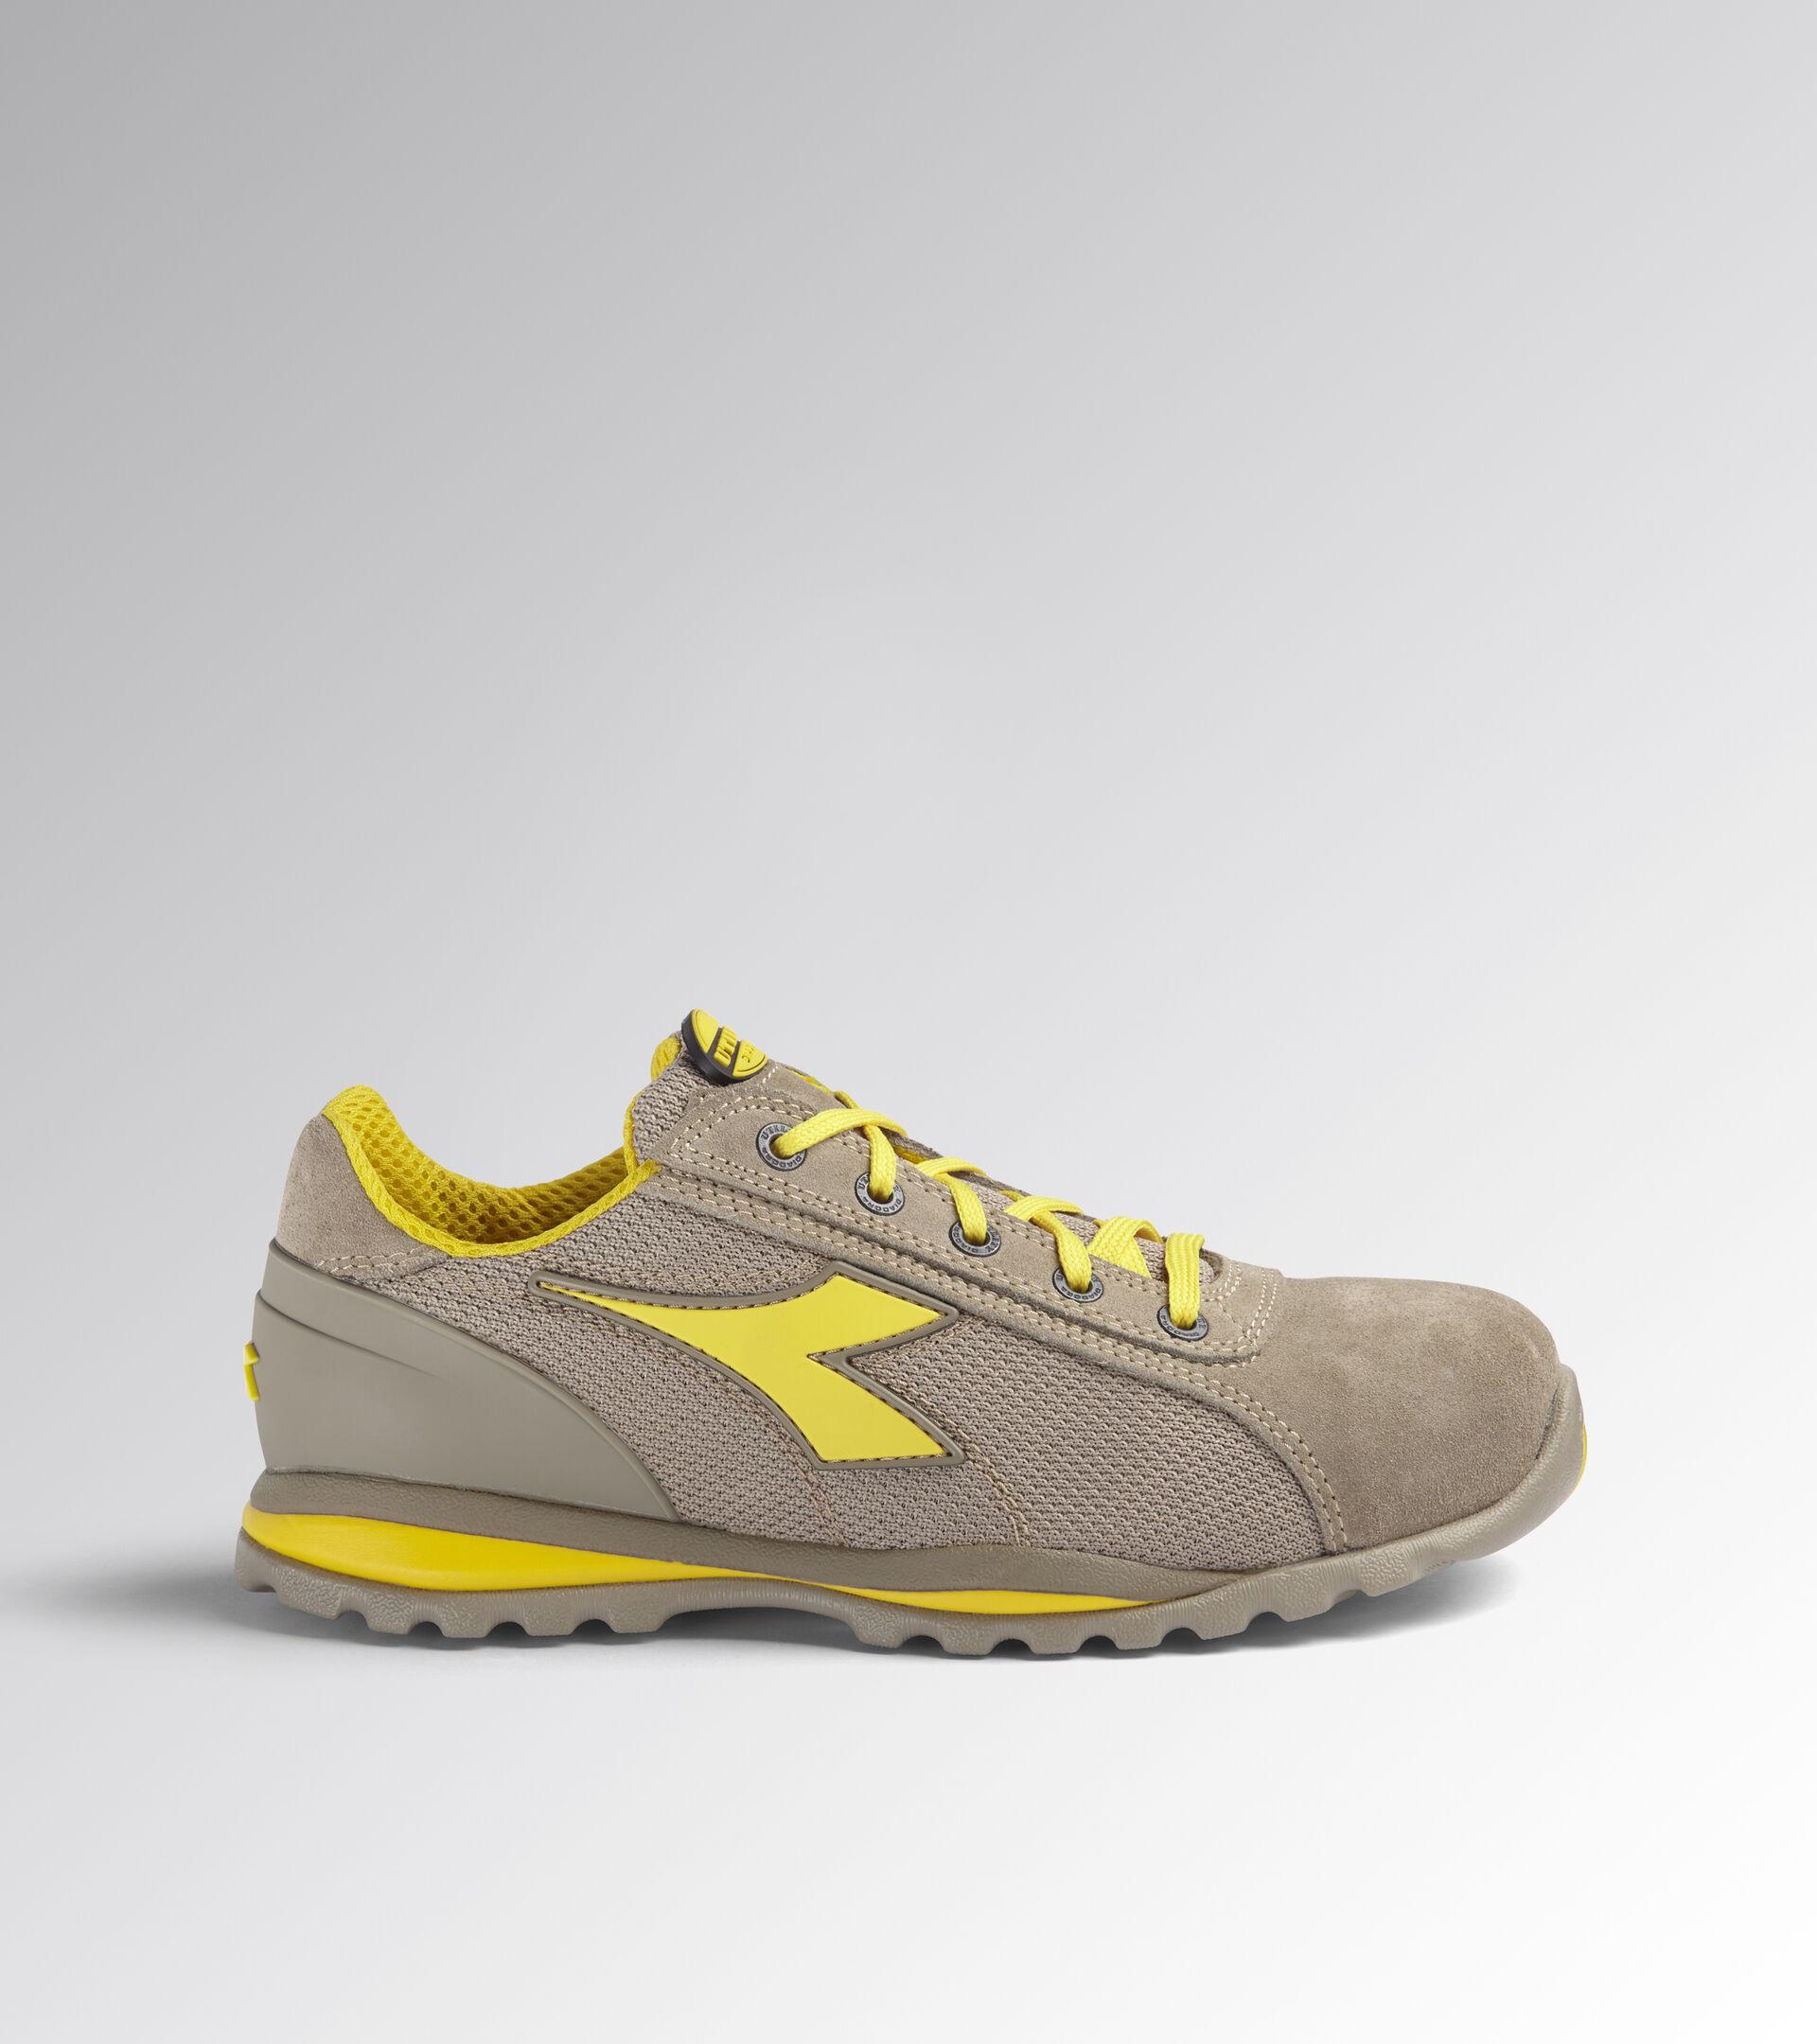 Footwear Utility UNISEX GLOVE TEXT LOW S1P HRO SRA MONDGESTEIN Utility